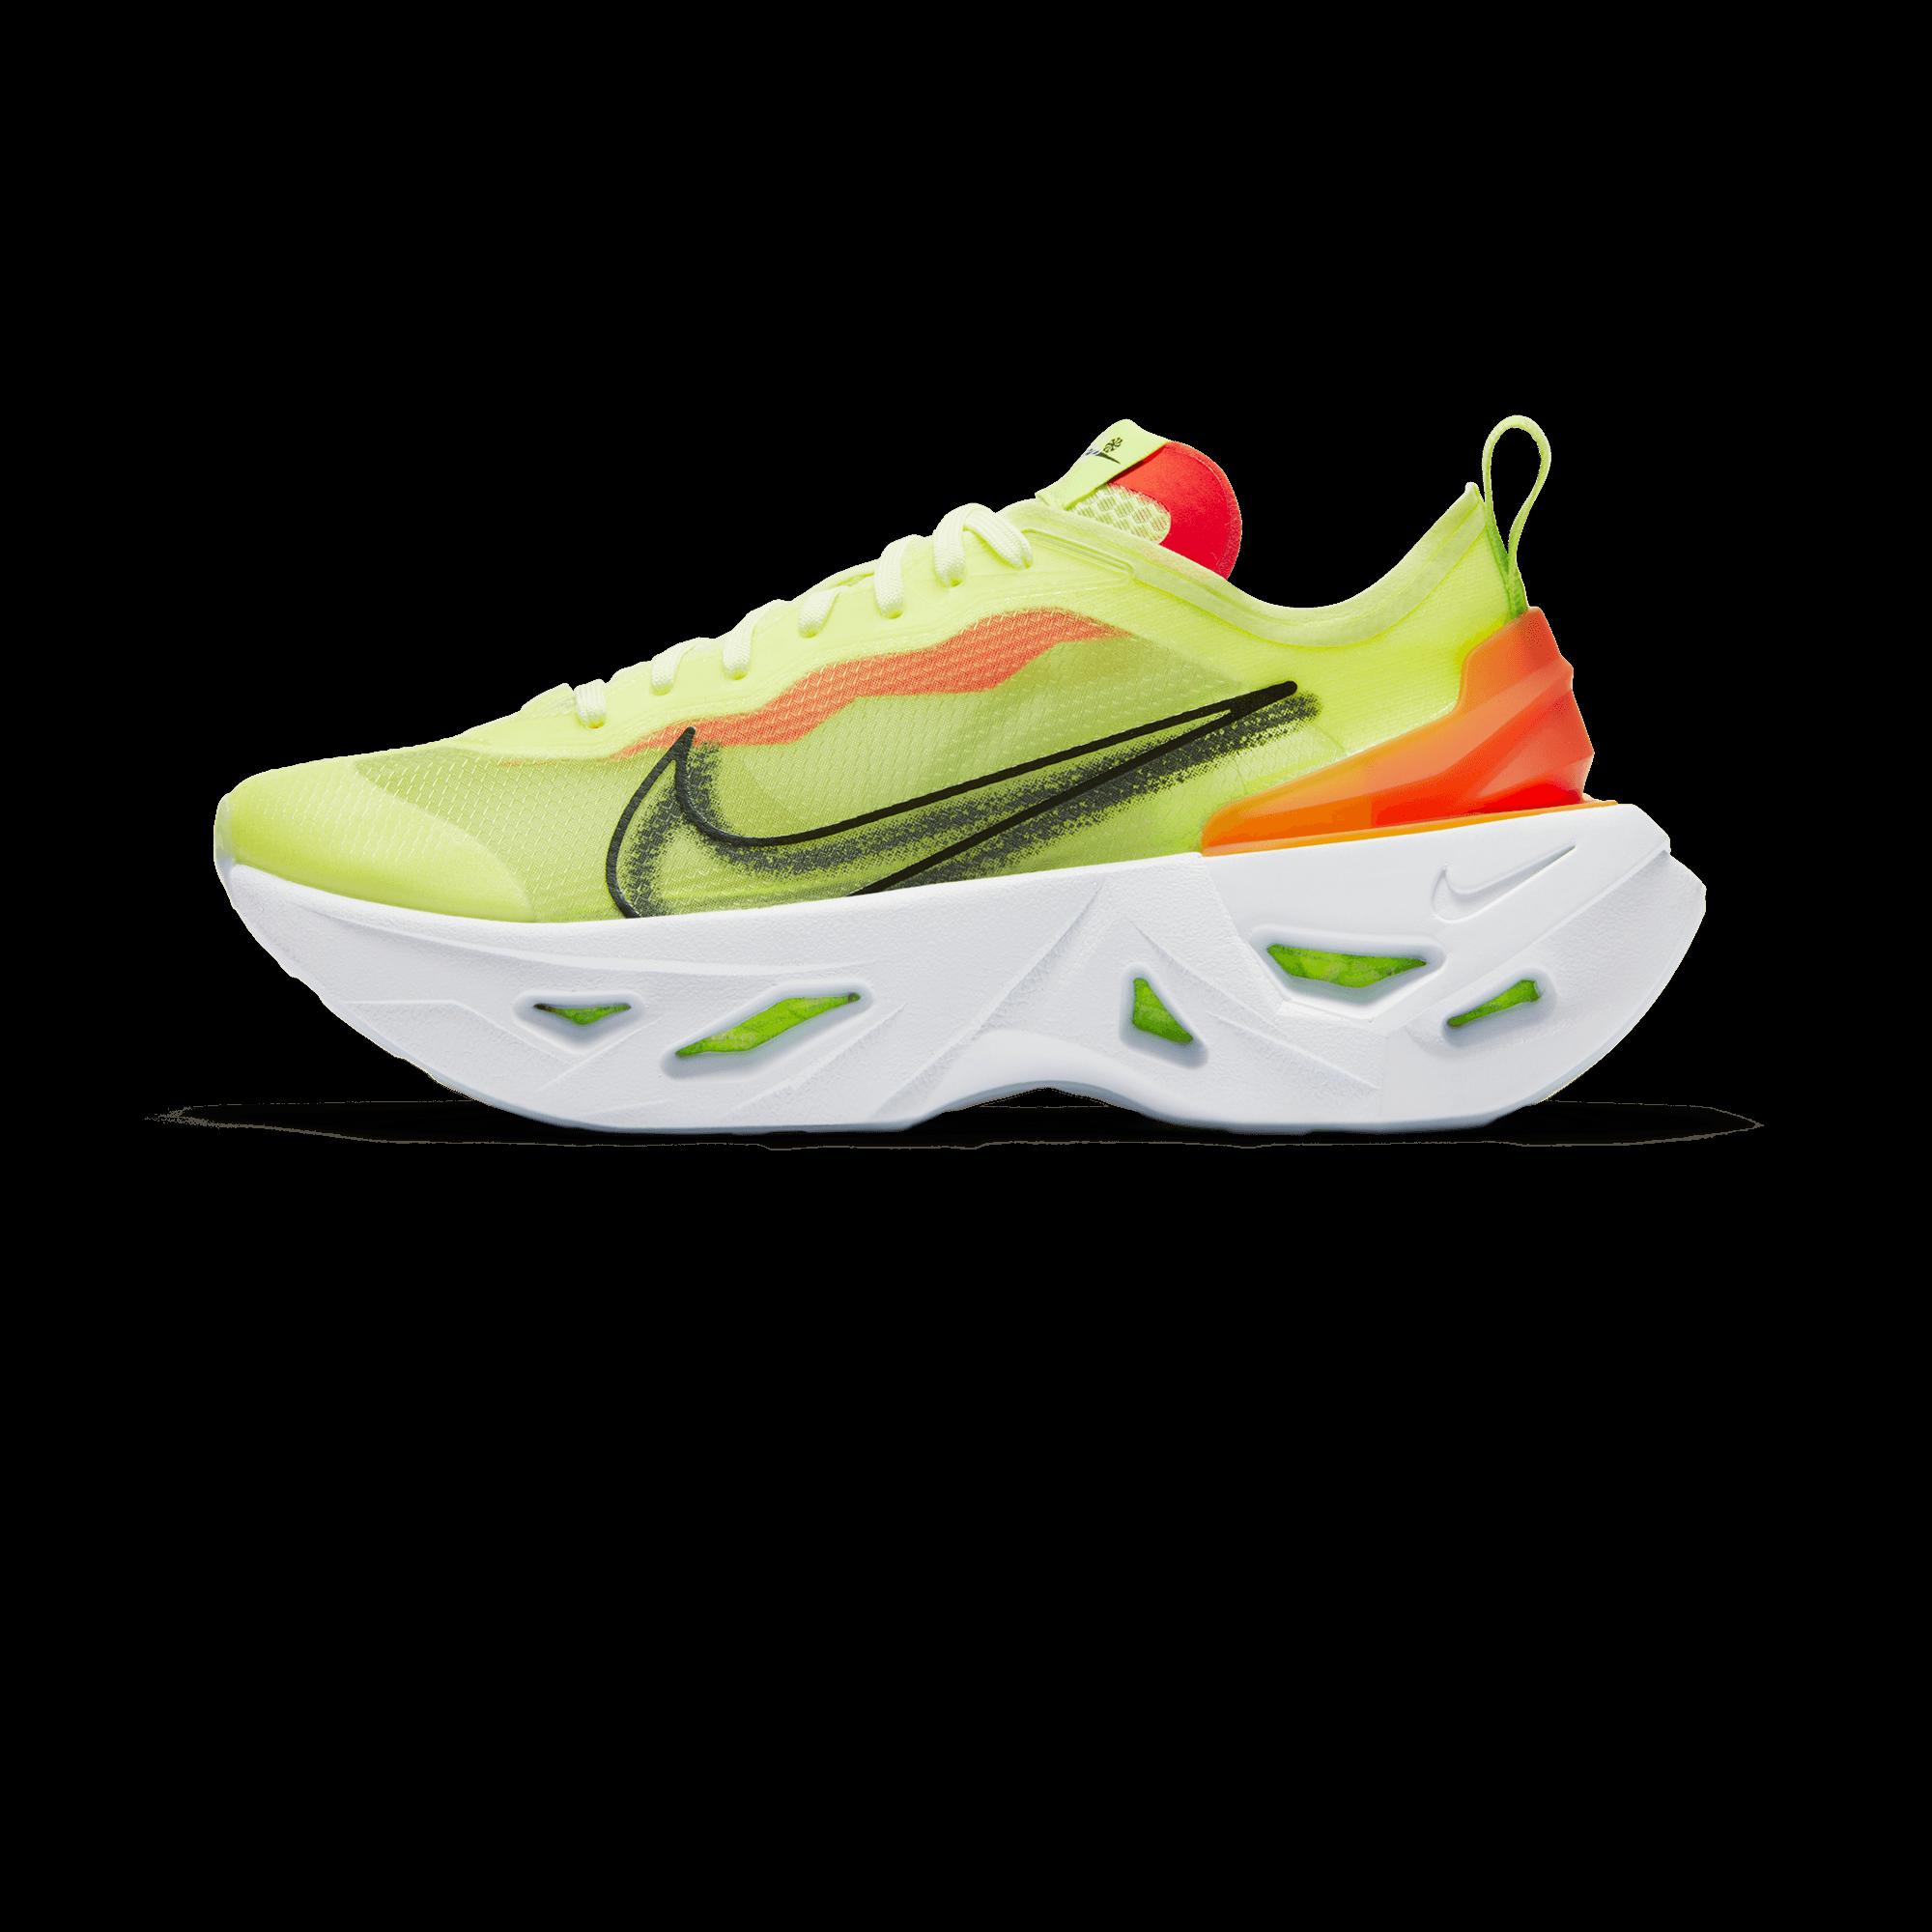 Nike W ZoomX Vista Grind barely volt / black / electric green - Donna |  Holypopstore.com